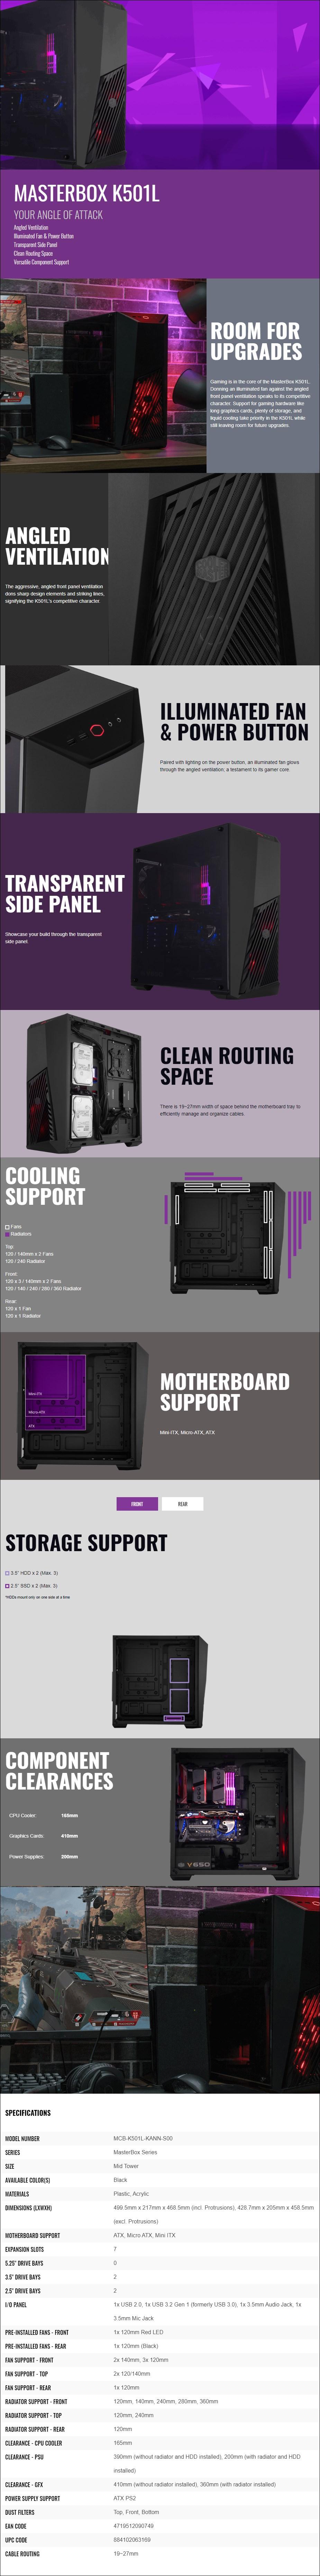 cooler-master-masterbox-k501l-midtower-atx-case-black-ac28144-7.jpg